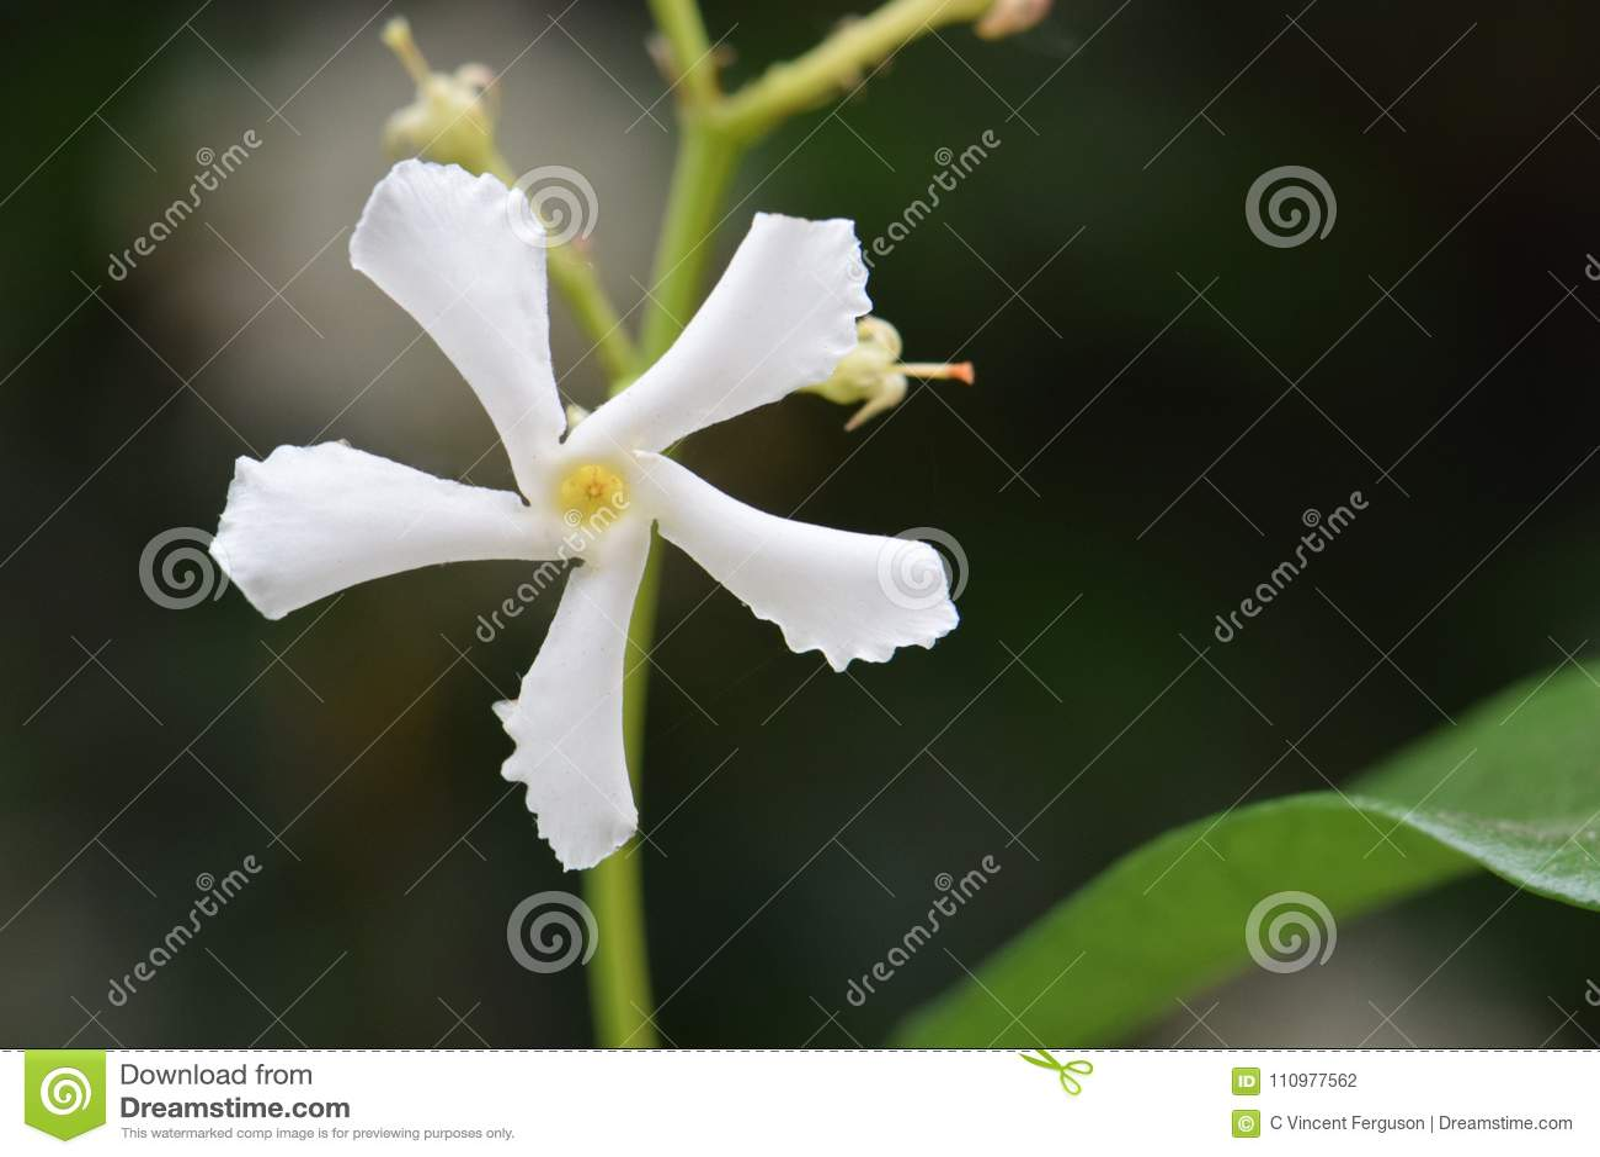 White Jasmine Star Flower Stock Photo Image Of Star 110977562